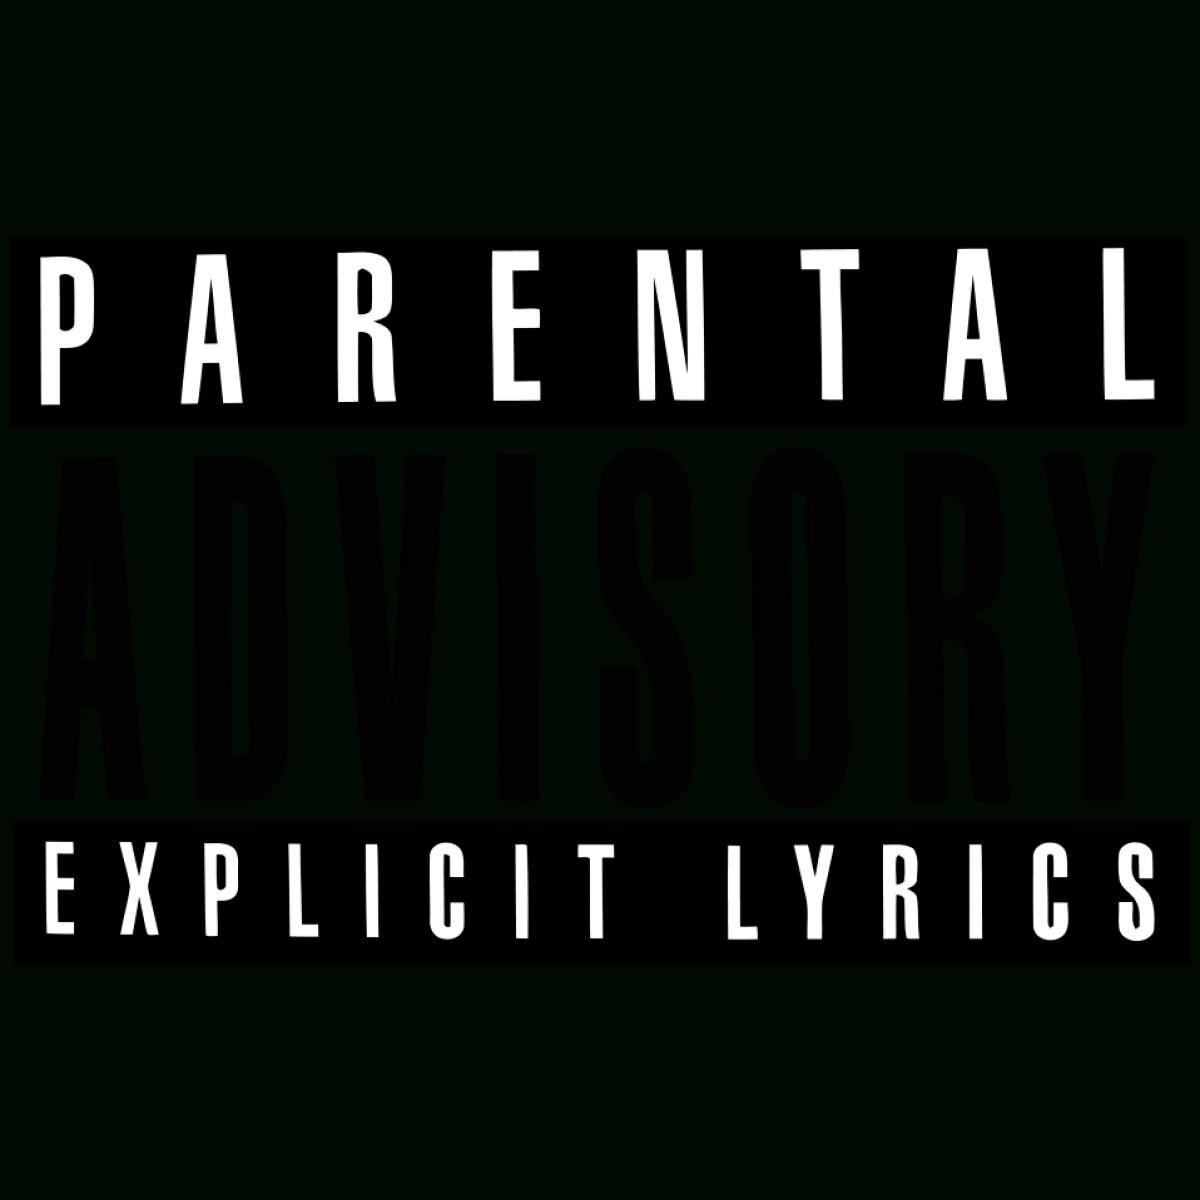 parental advisory explicit lyrics transparent png - stickpng